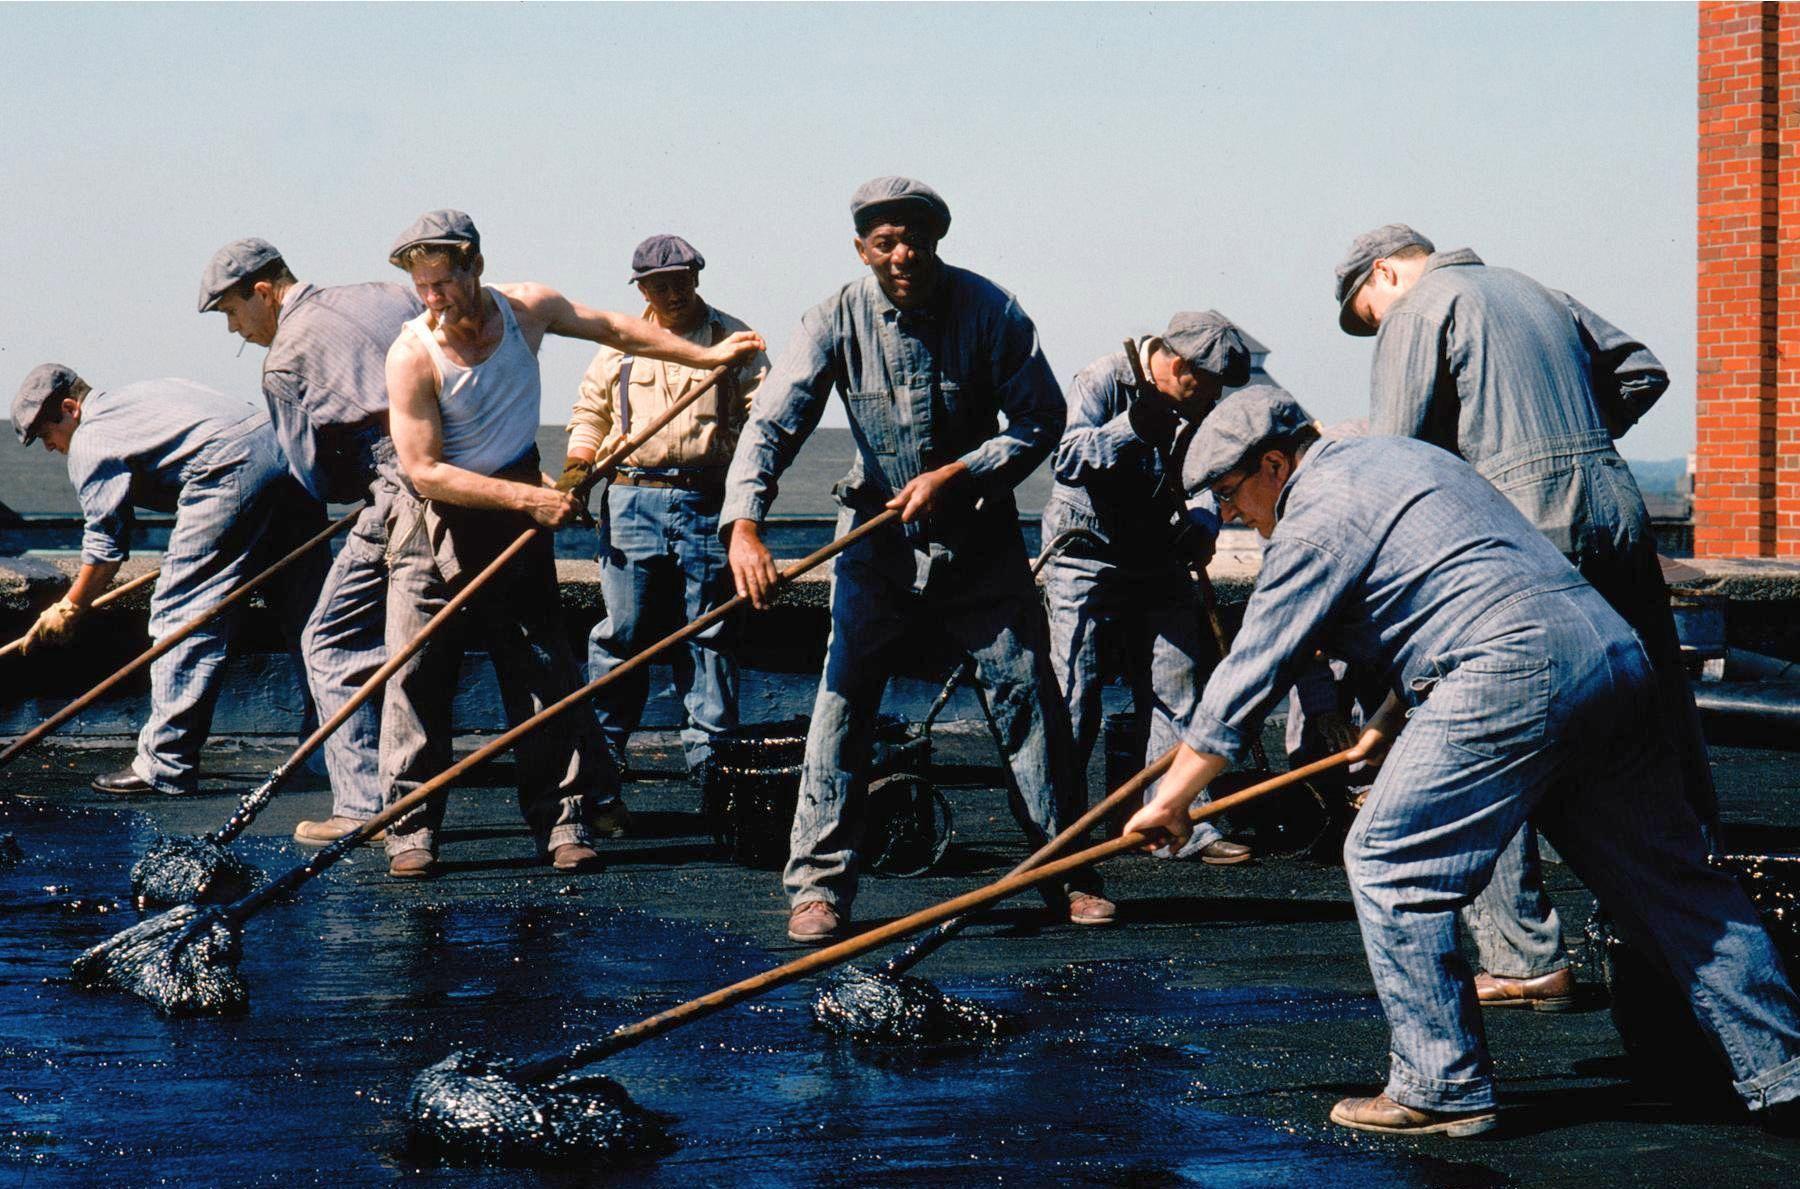 Morgan Freeman, William Sadler, Larry Brandenburg, Neil Giuntoli, Brian Libby, and James Whitmore in The Shawshank Redemption (1994)